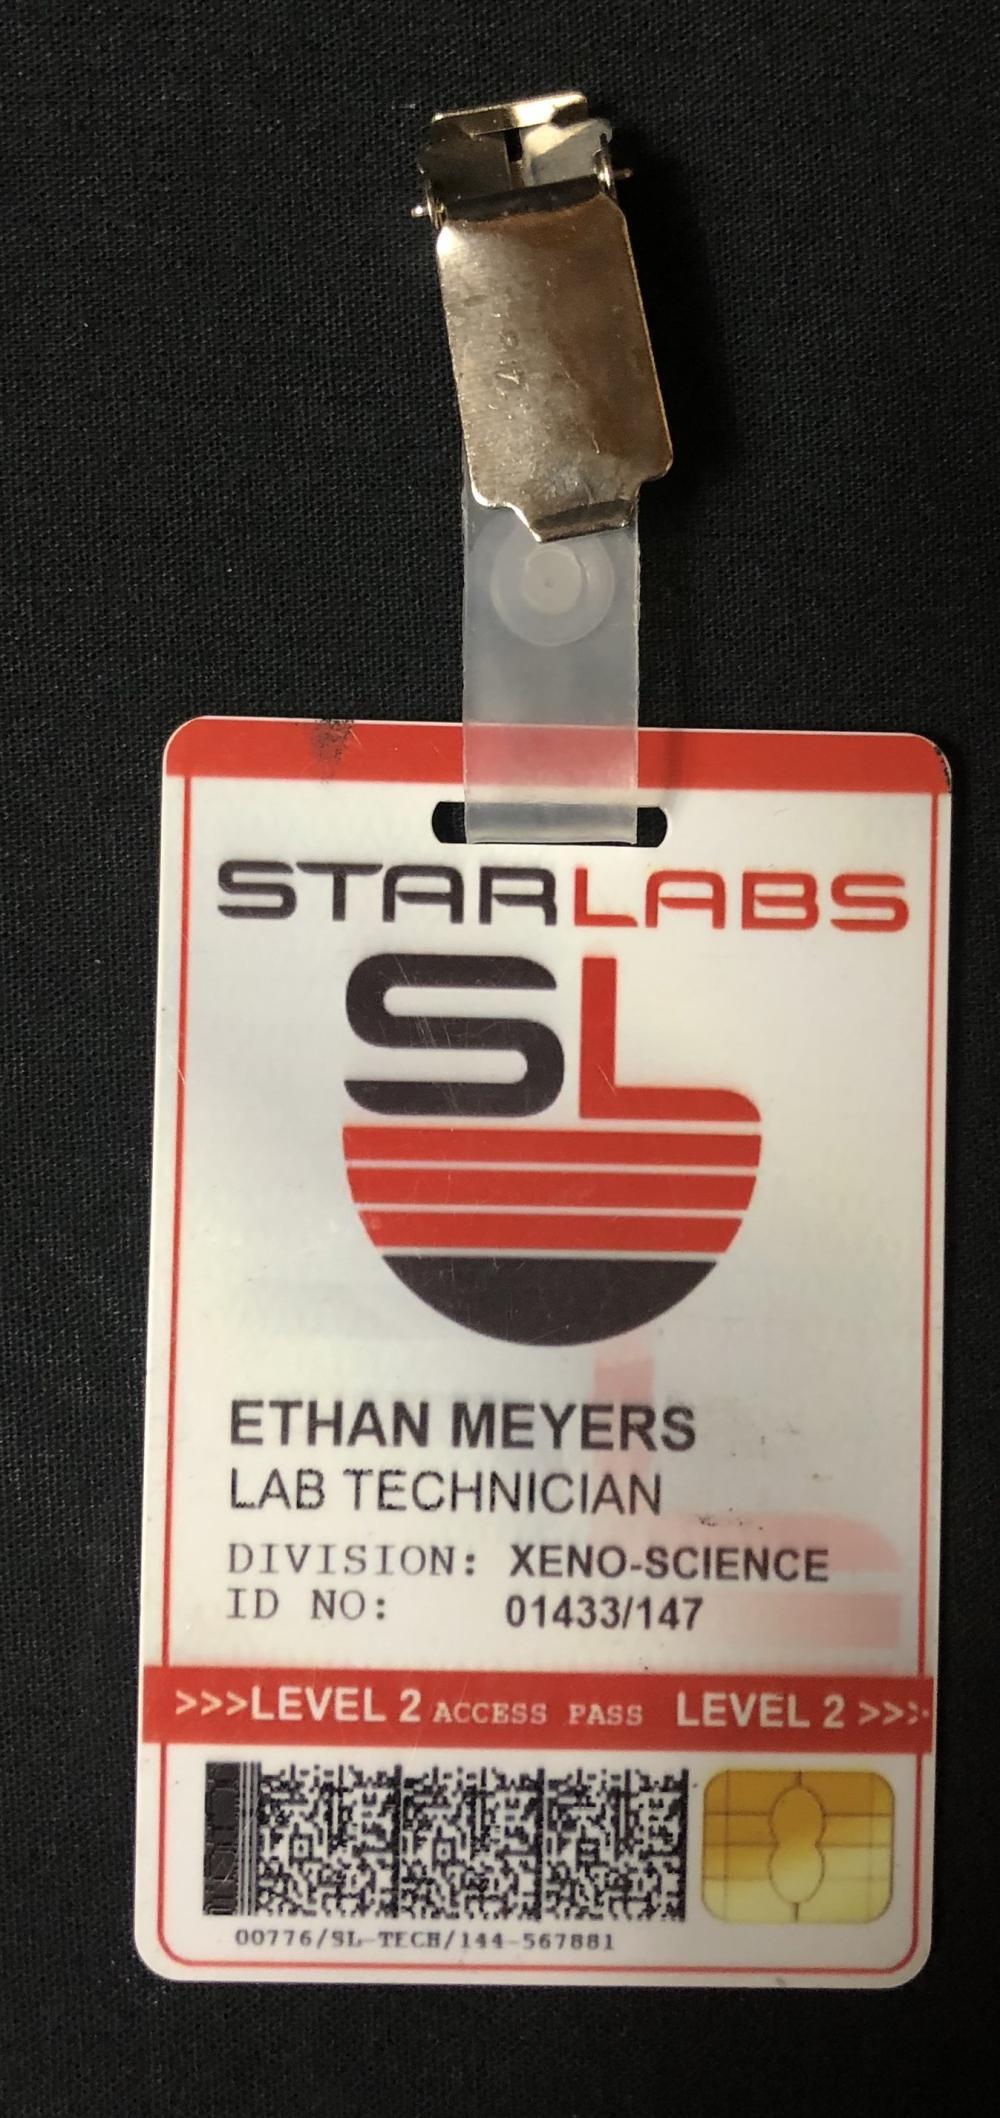 Batman v Superman: Dawn of Justice (2016) - Starlabs Lab Technician Badge